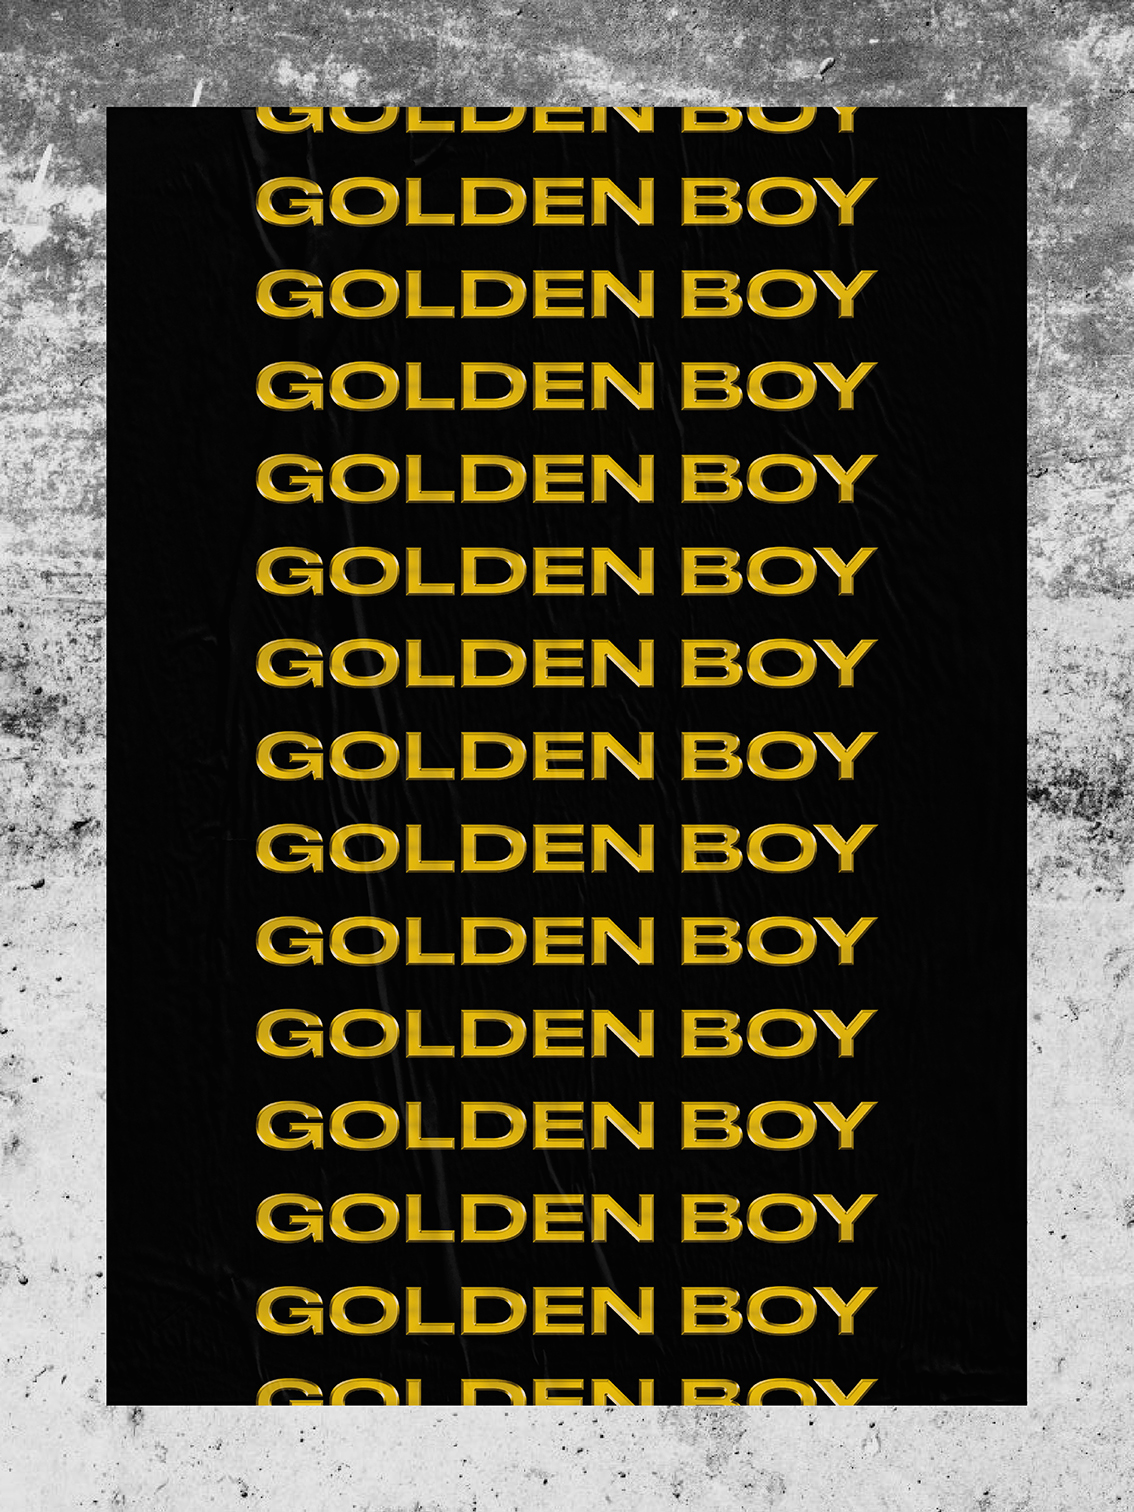 GoldenBoy-Poster5.jpg